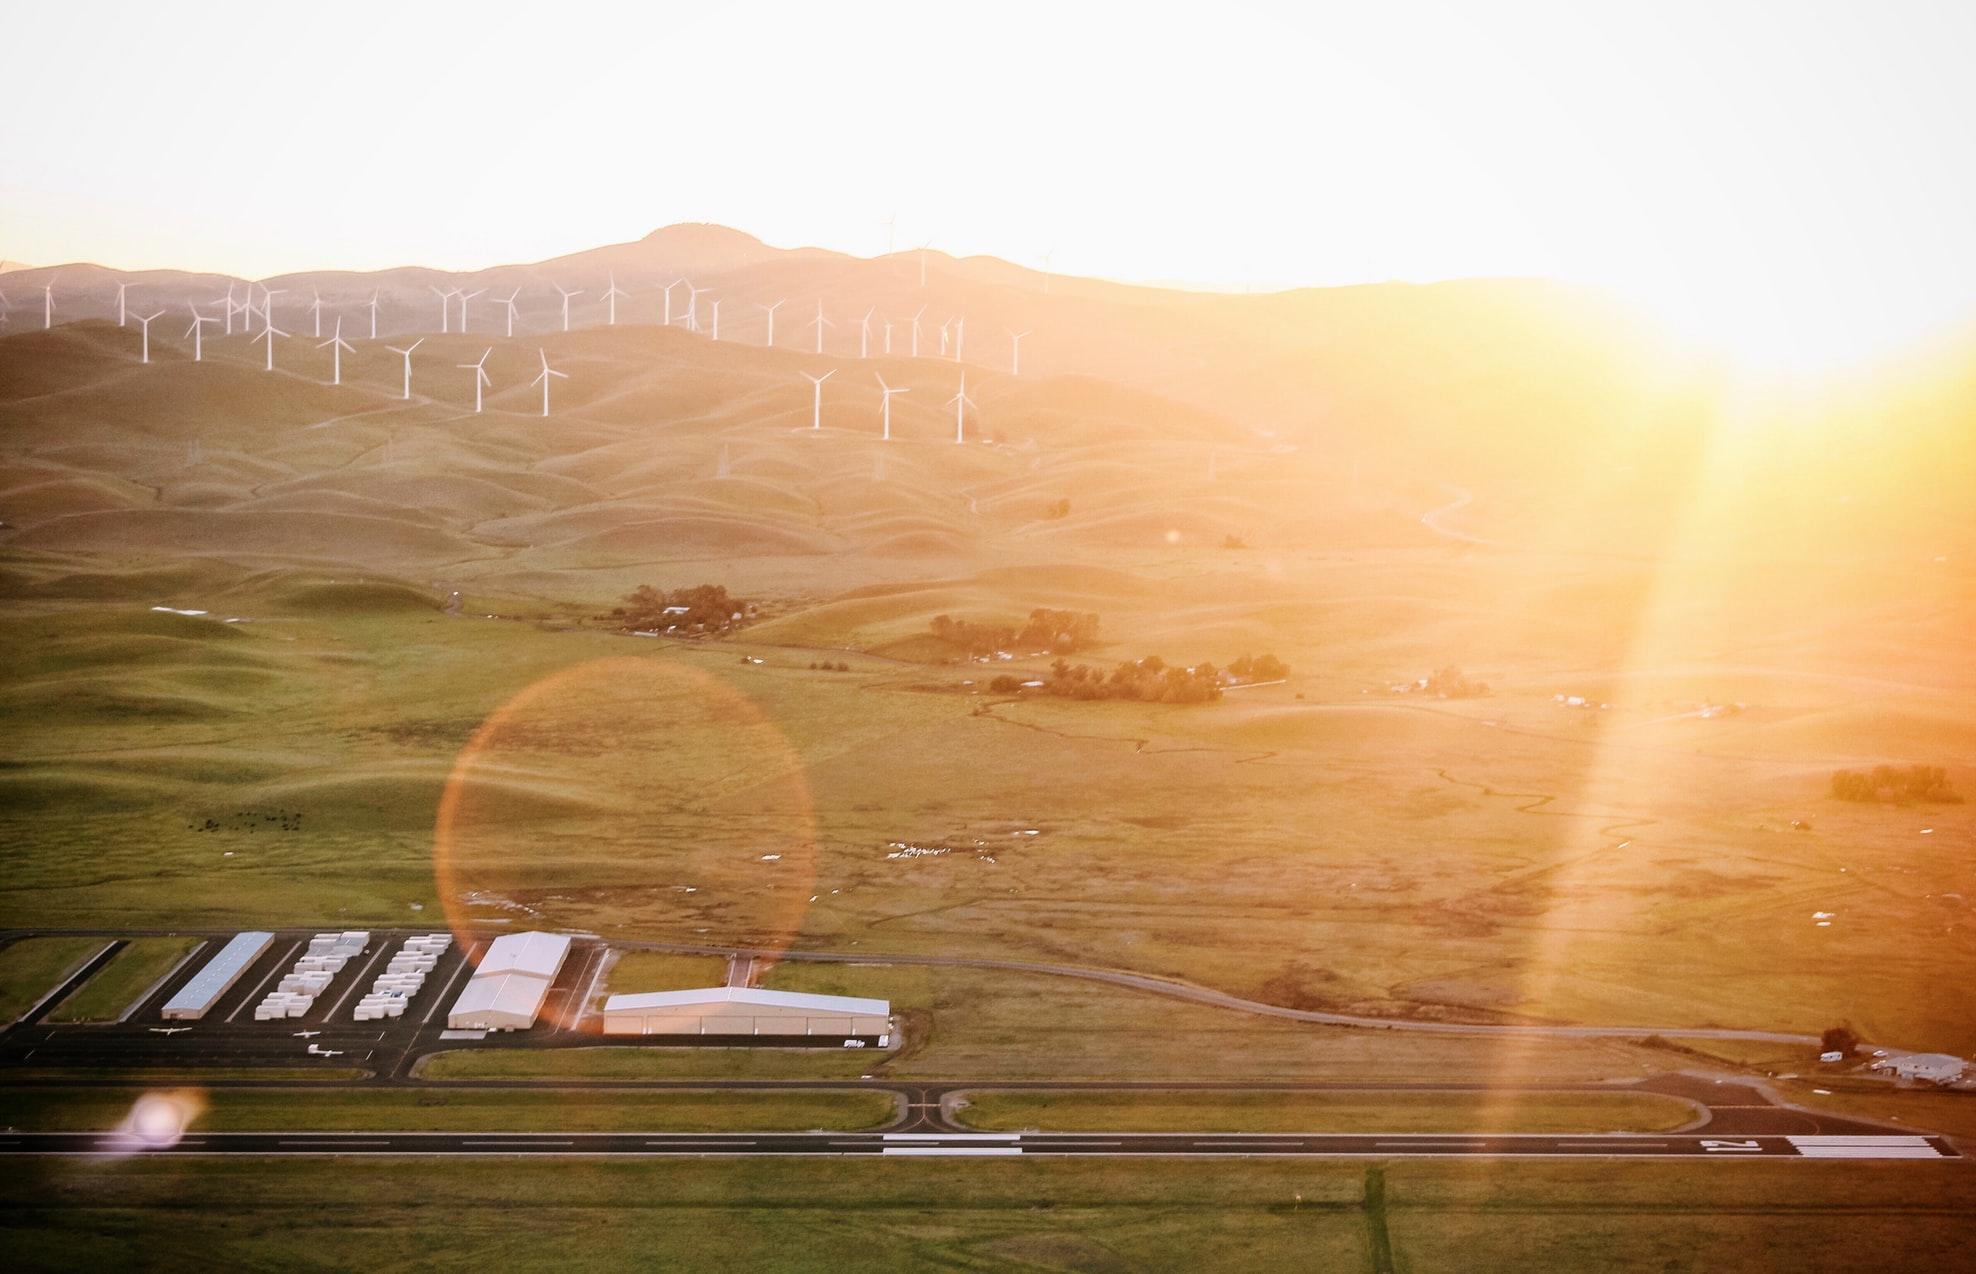 Australian airport sustainability